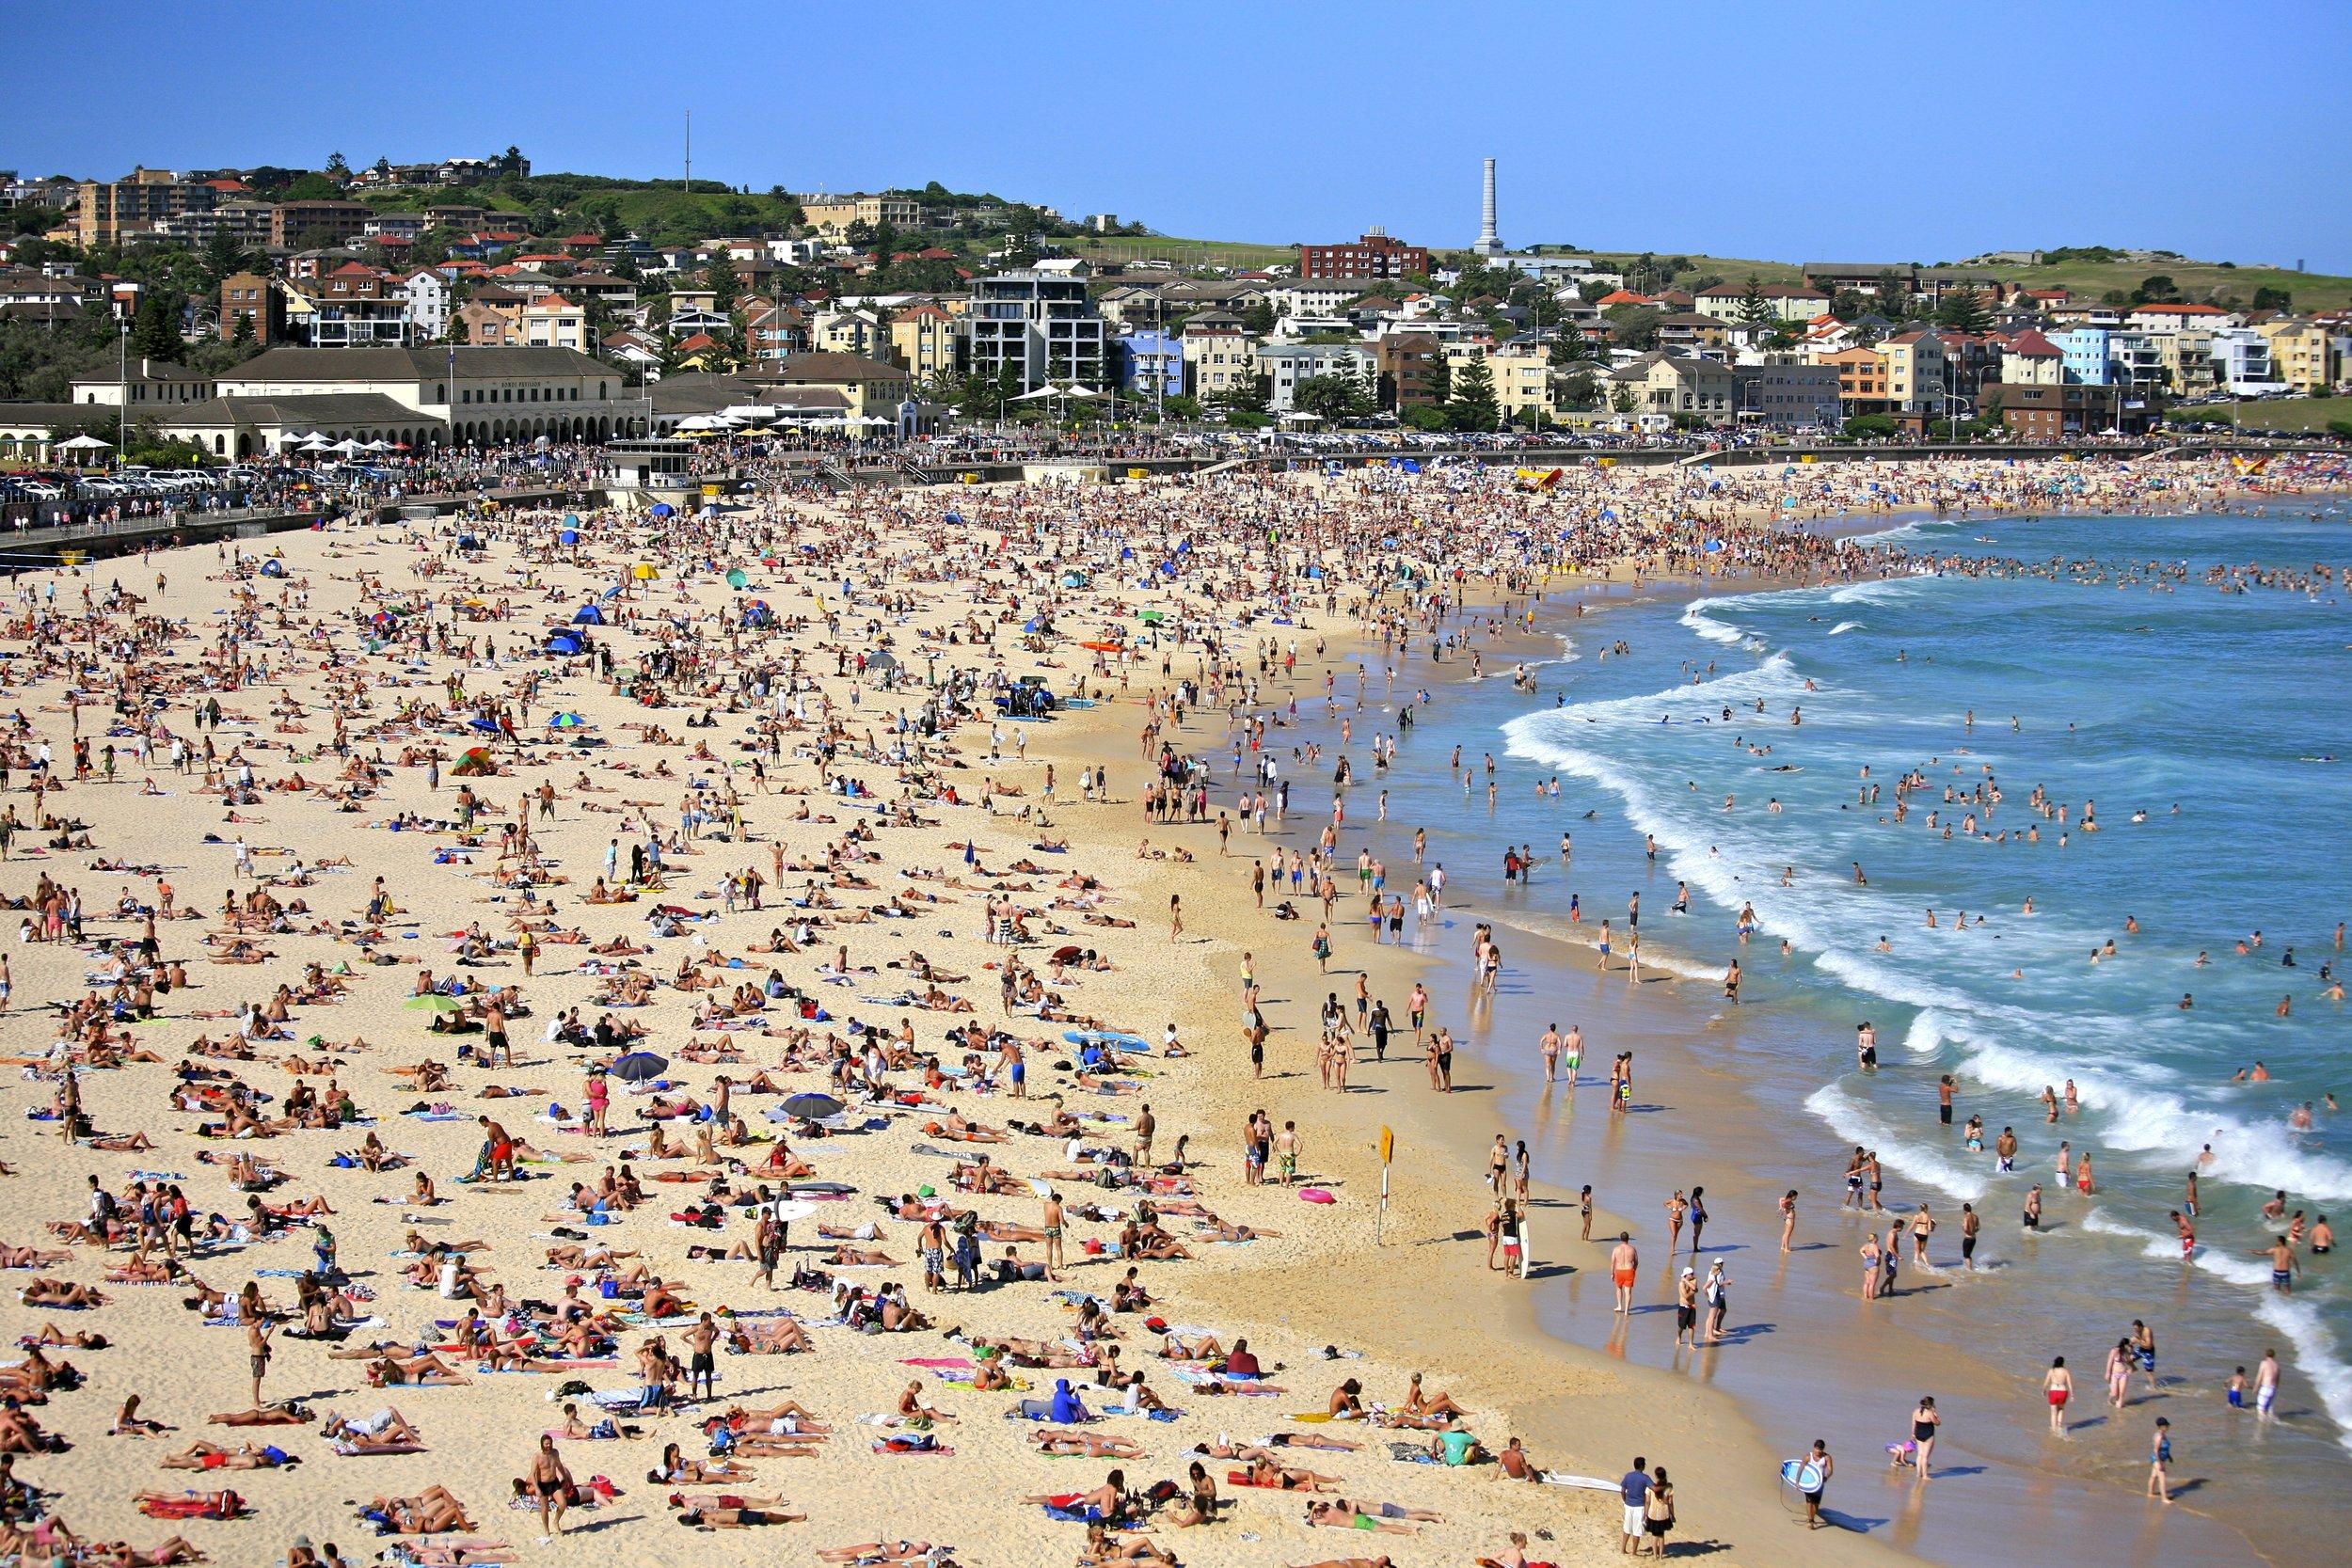 The_Famous_Bondi_Beach_(6644010871).jpg